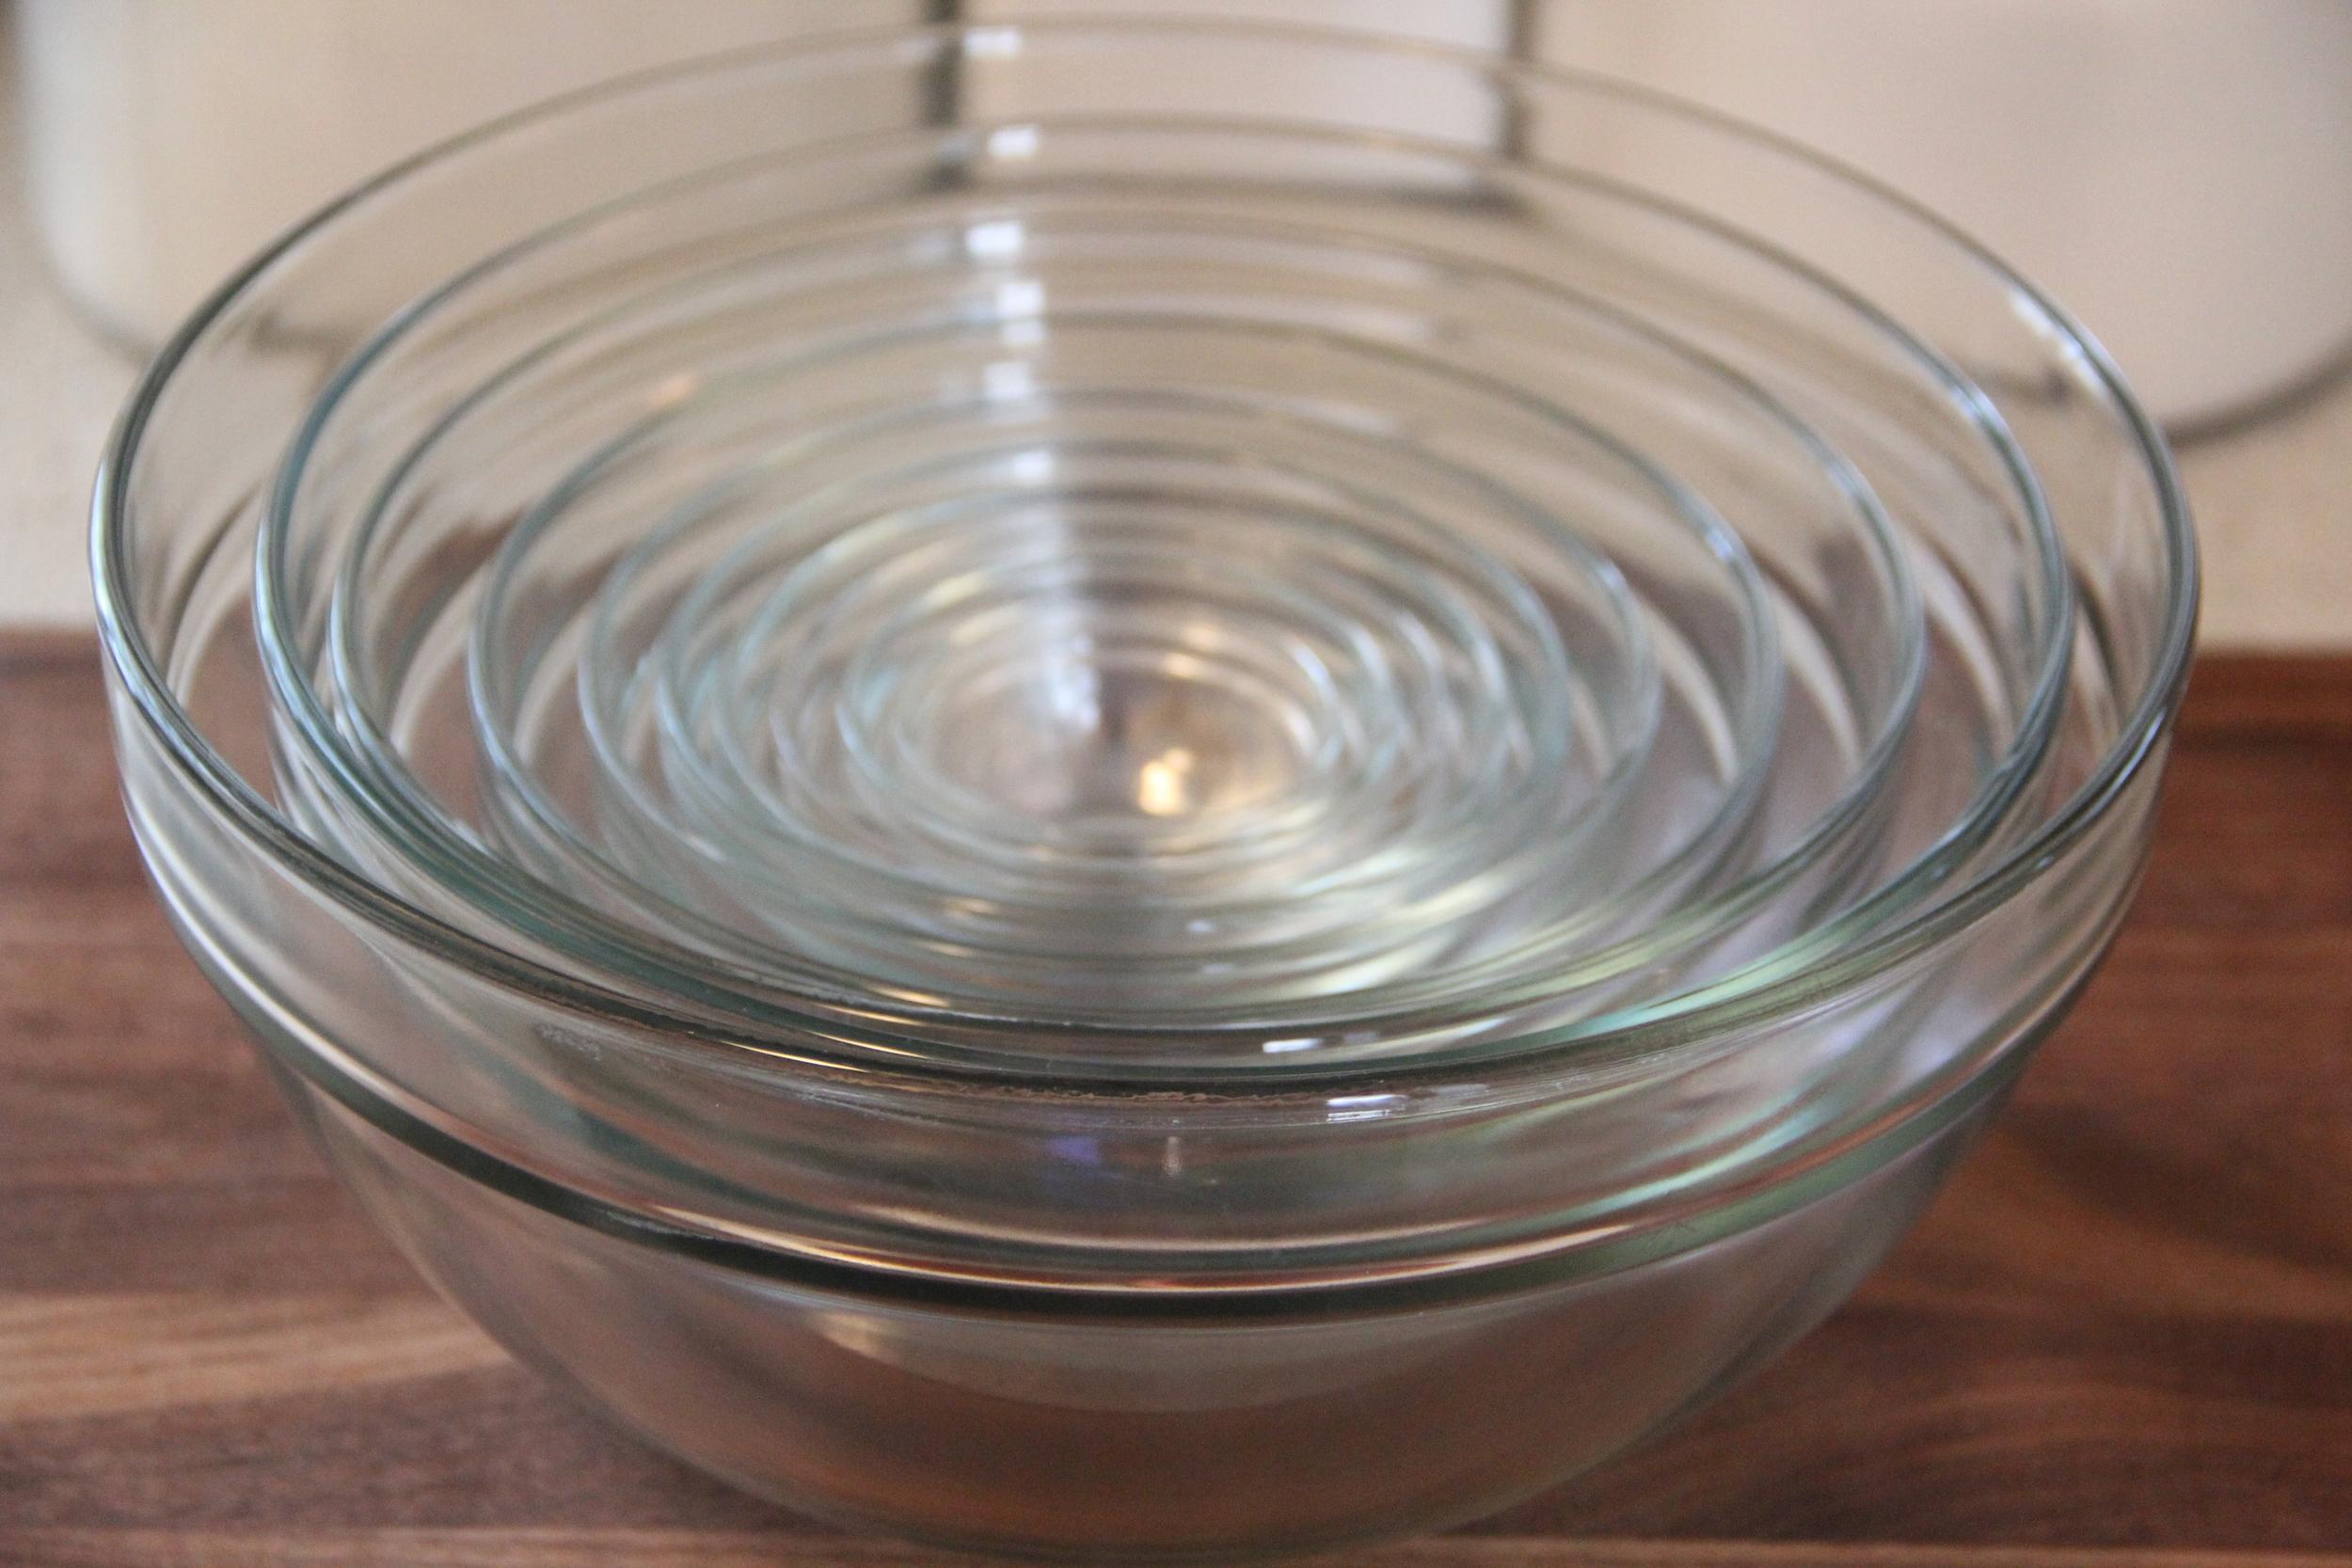 Williams Sonoma 10 Piece Mixing Bowls.JPG